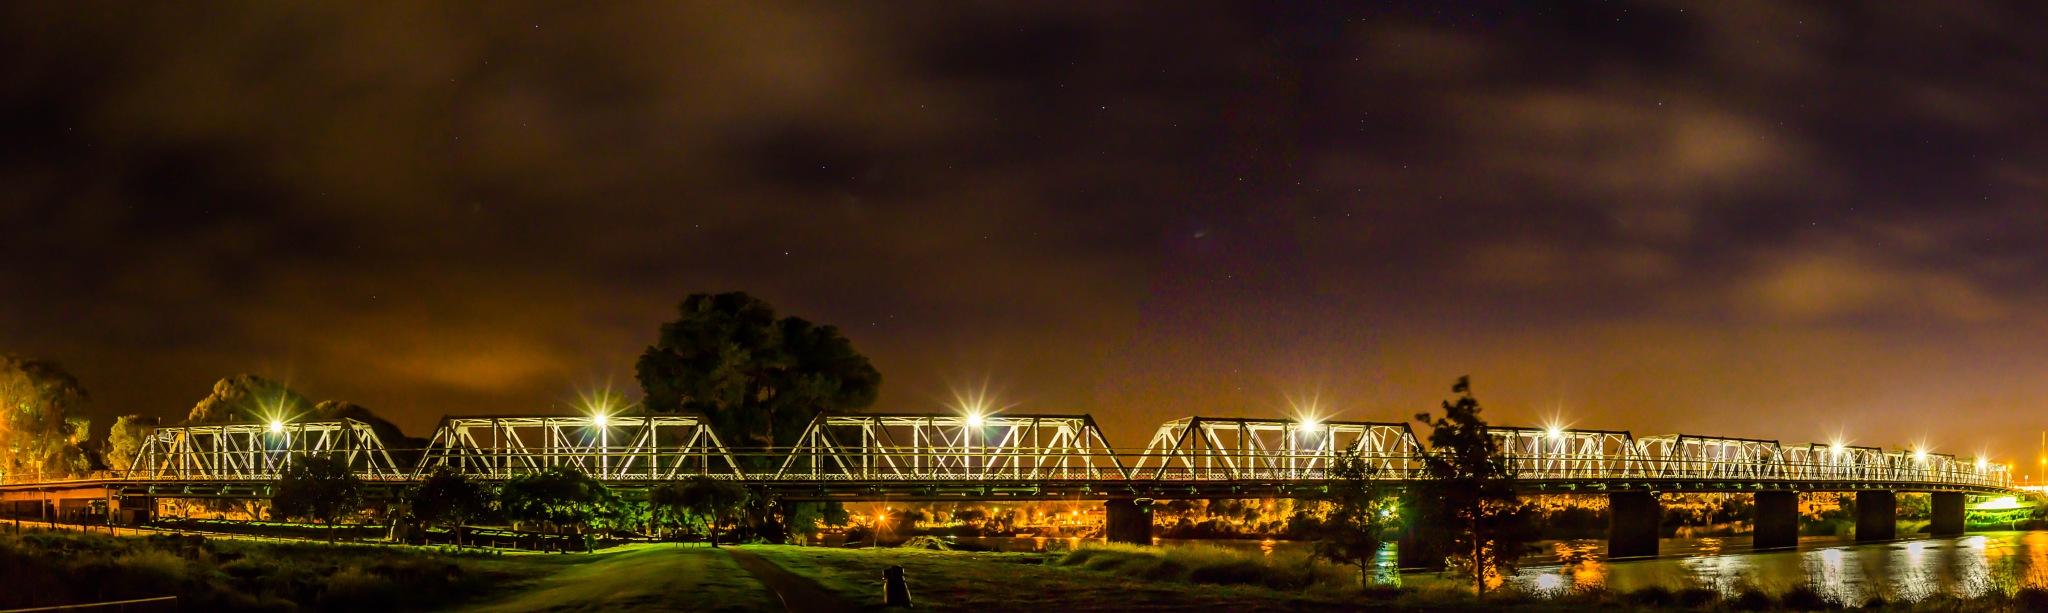 Dublin St Bridge #2 by AnnekaBarrittphotographyNZ